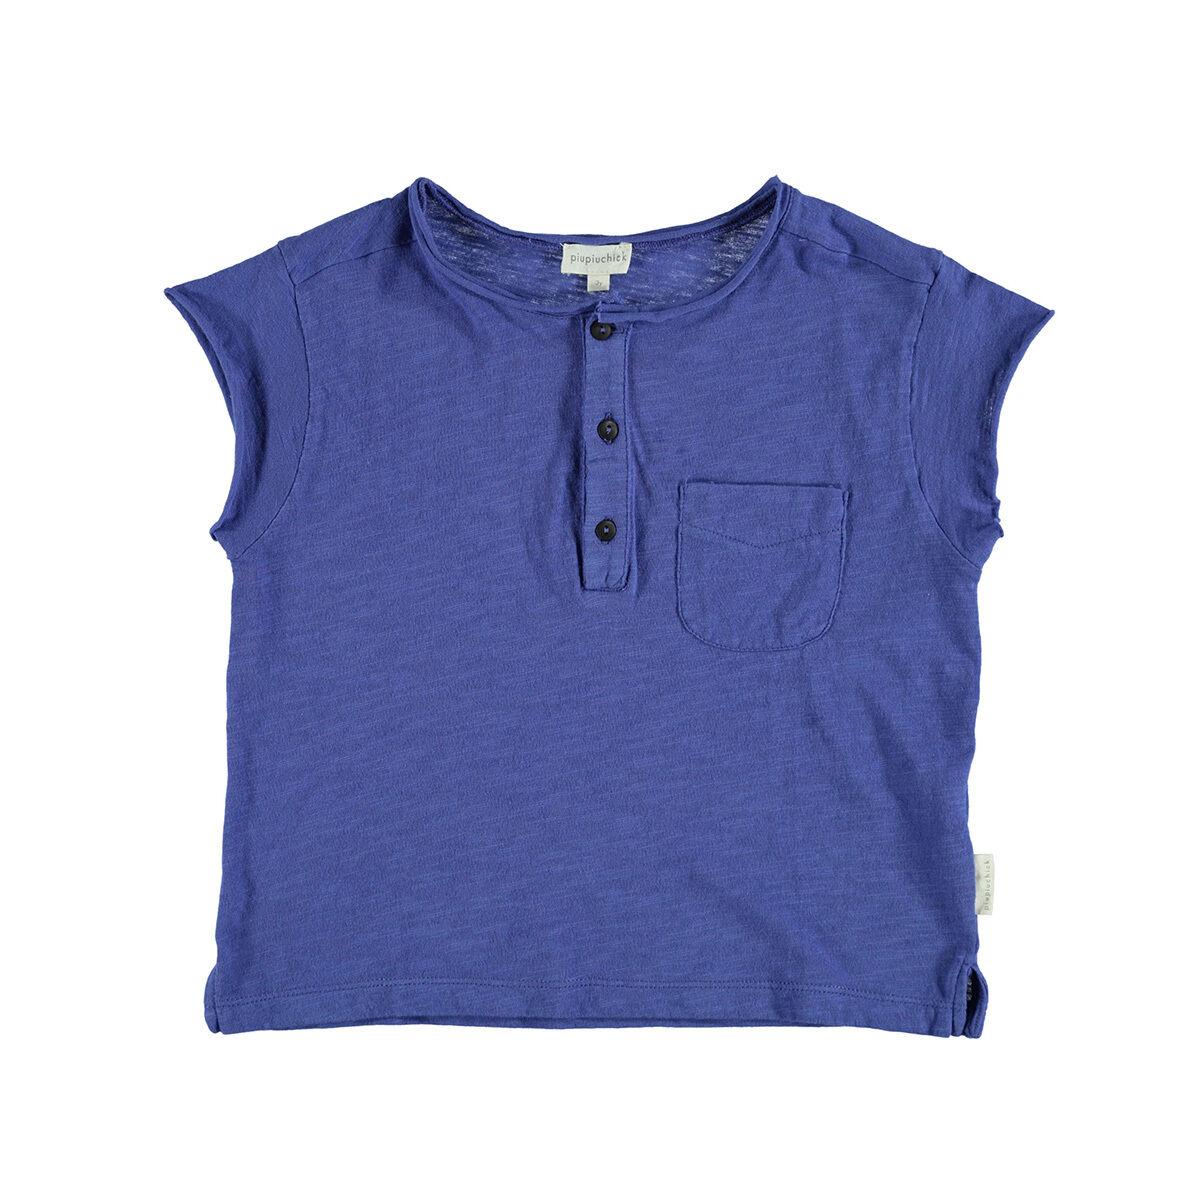 Piupiuchick T-Shirt Bleu - 18 Mois